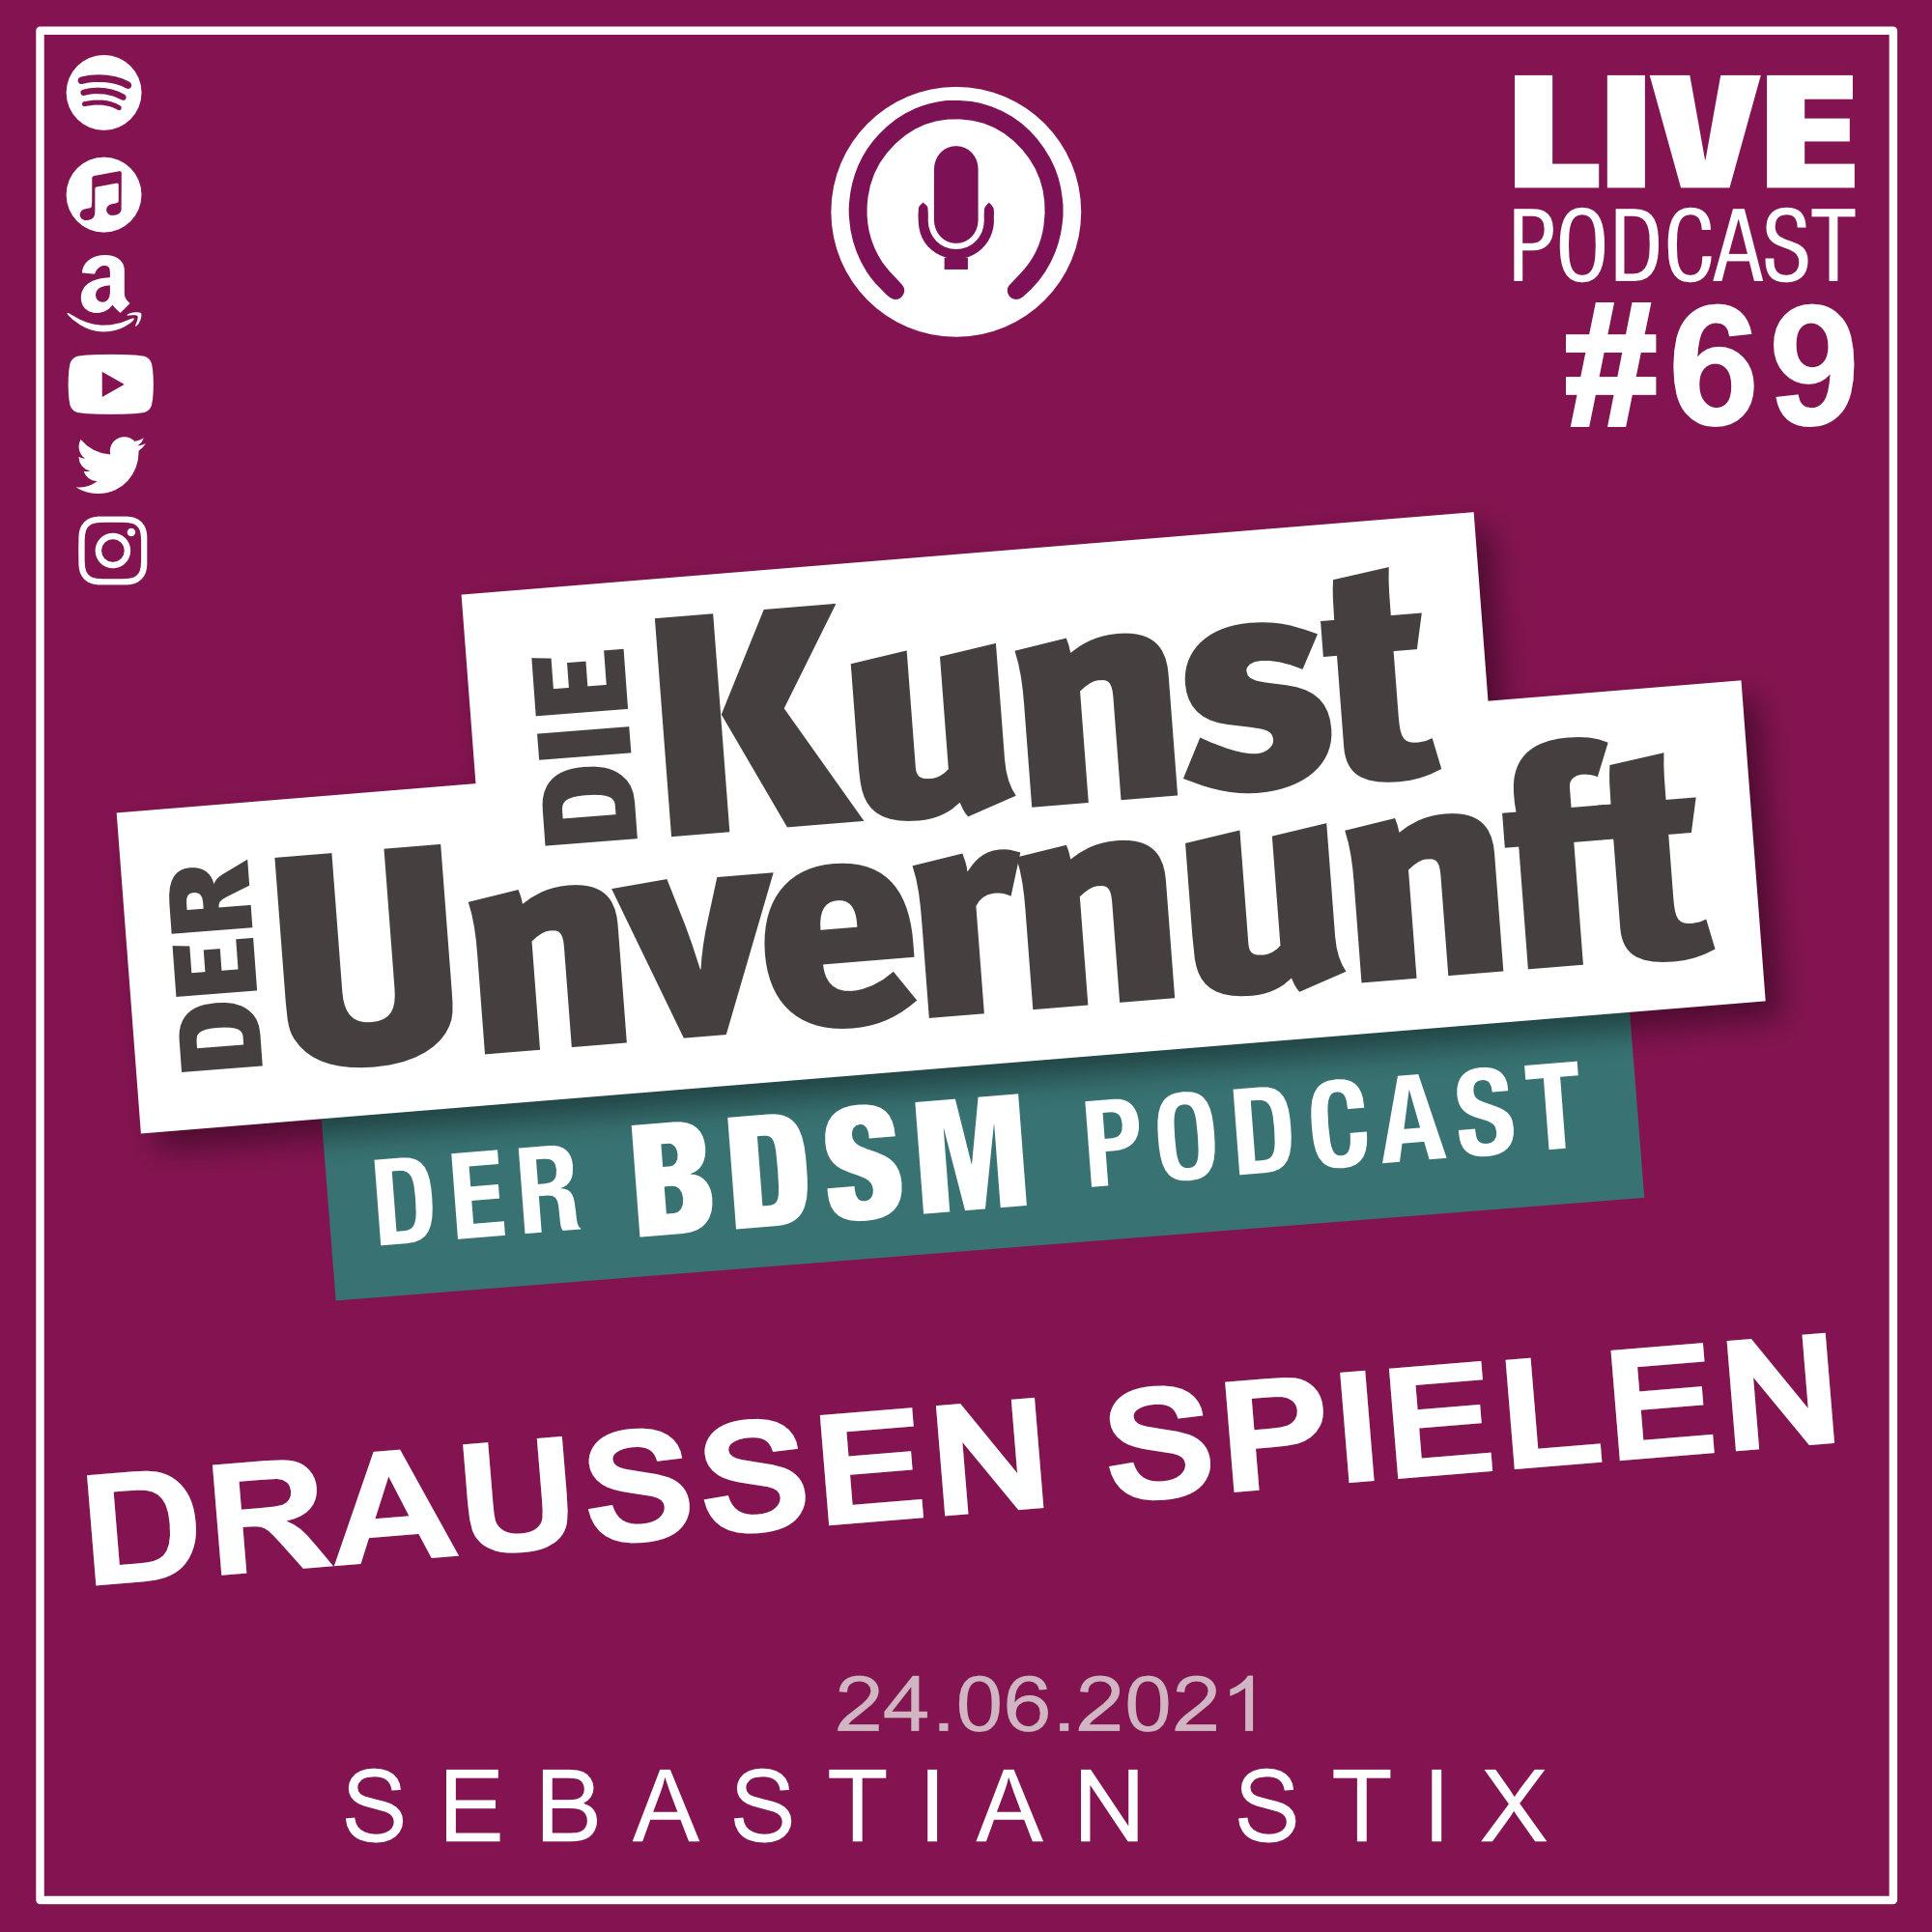 Unvernunft Live 24.06.2021 - Thema DRAUSSEN